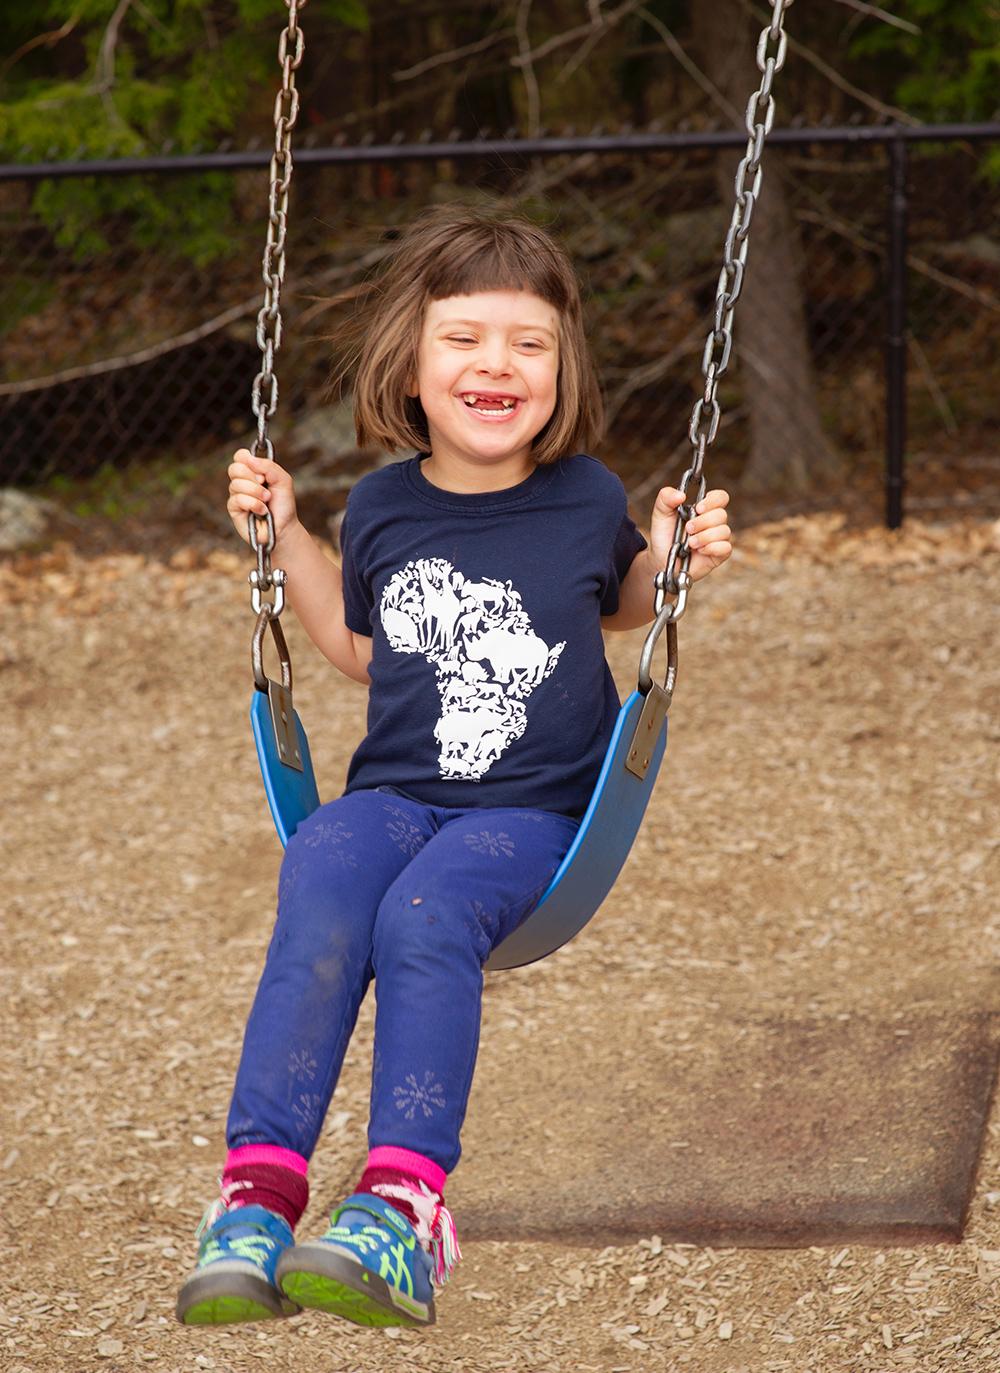 grinning girl on swing